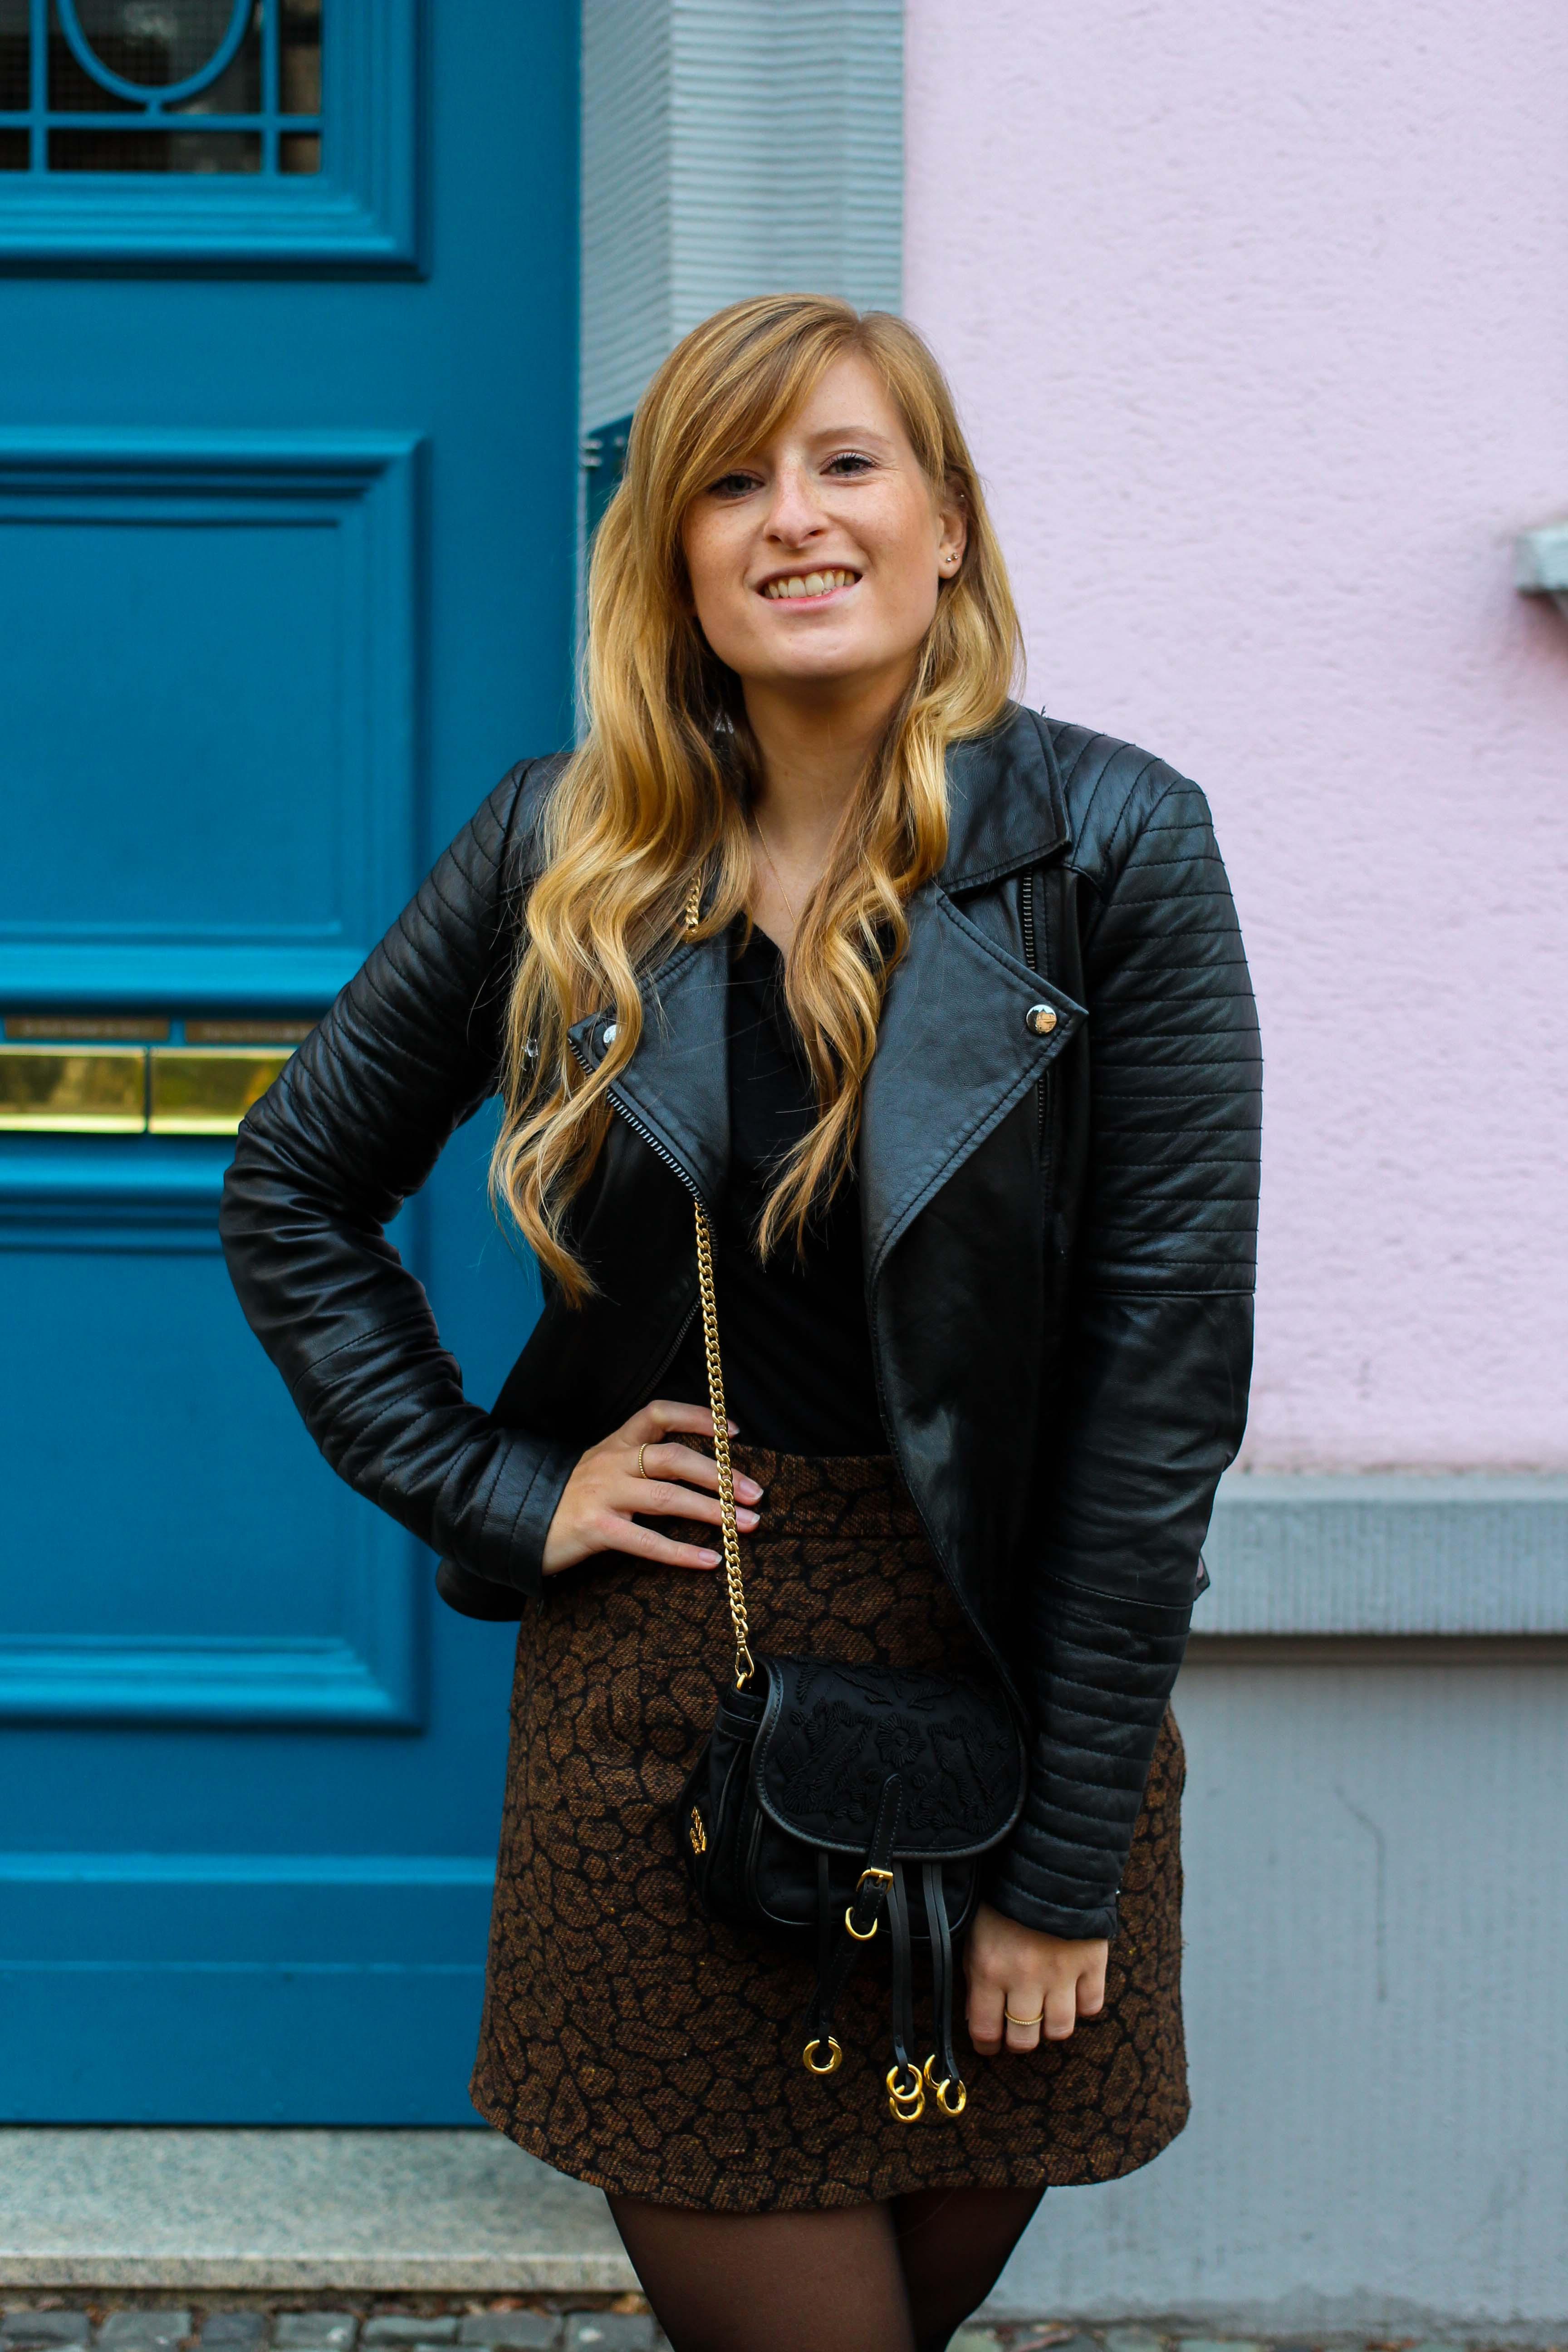 Leo Rock kombinieren Alltag Lederjacke Streetstyle Modeblog Prada Handtasche Stoff Edited Boots Frühling Strumpfhose 4